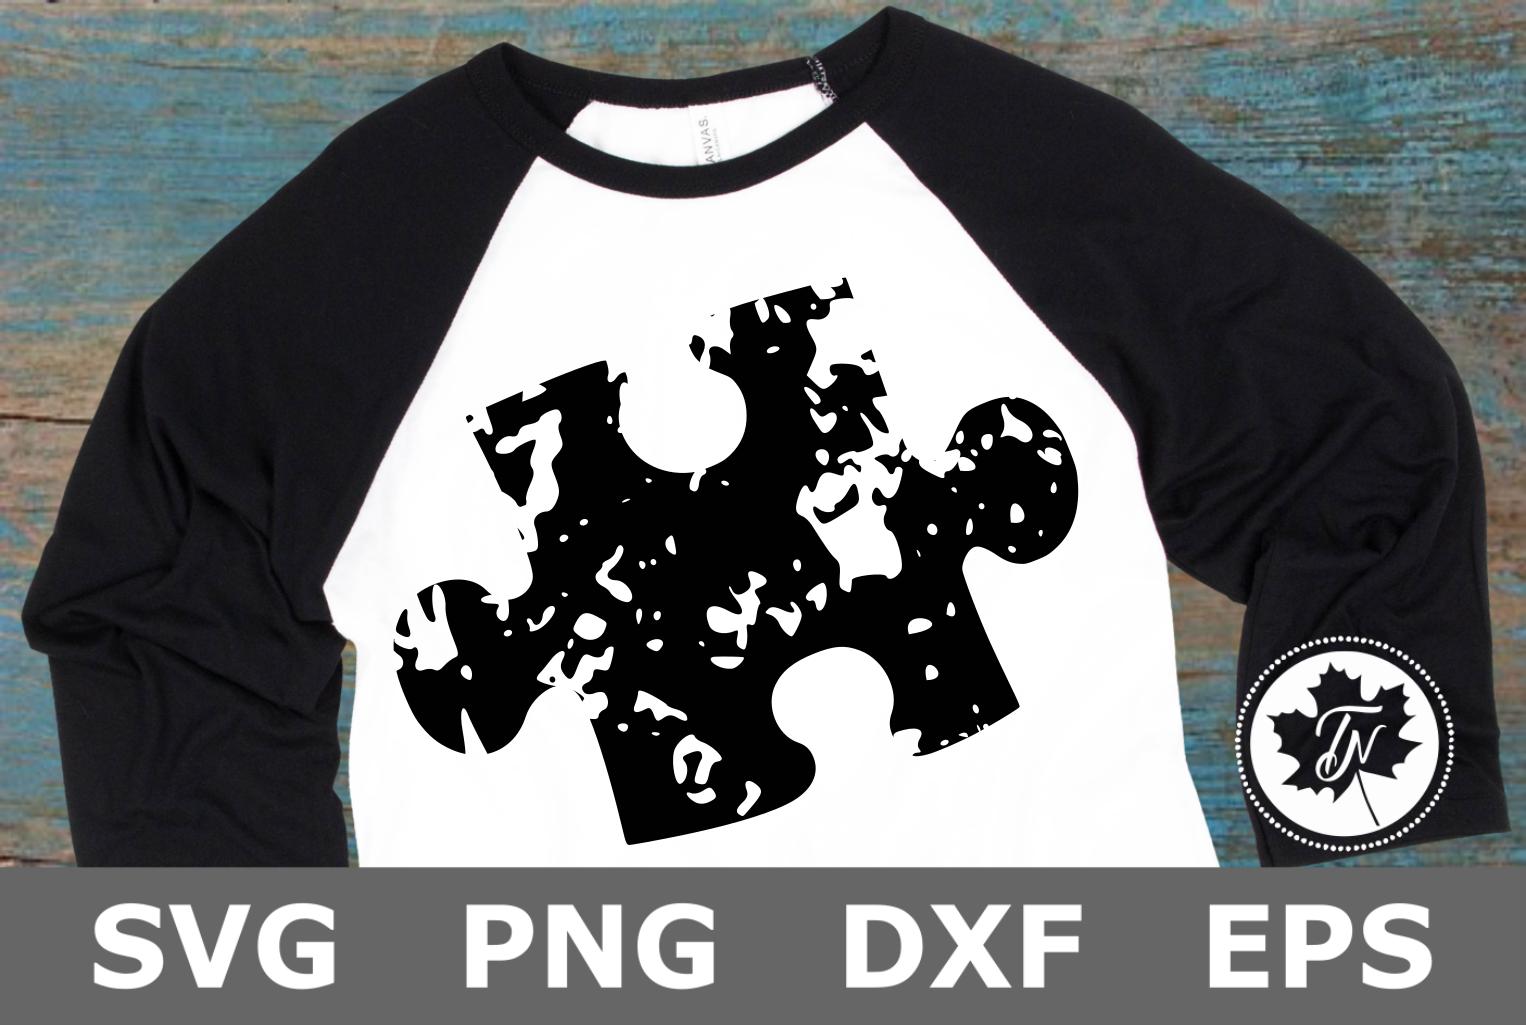 Grunge Puzzle Piece - An Autism Awareness SVG Cut File example image 1